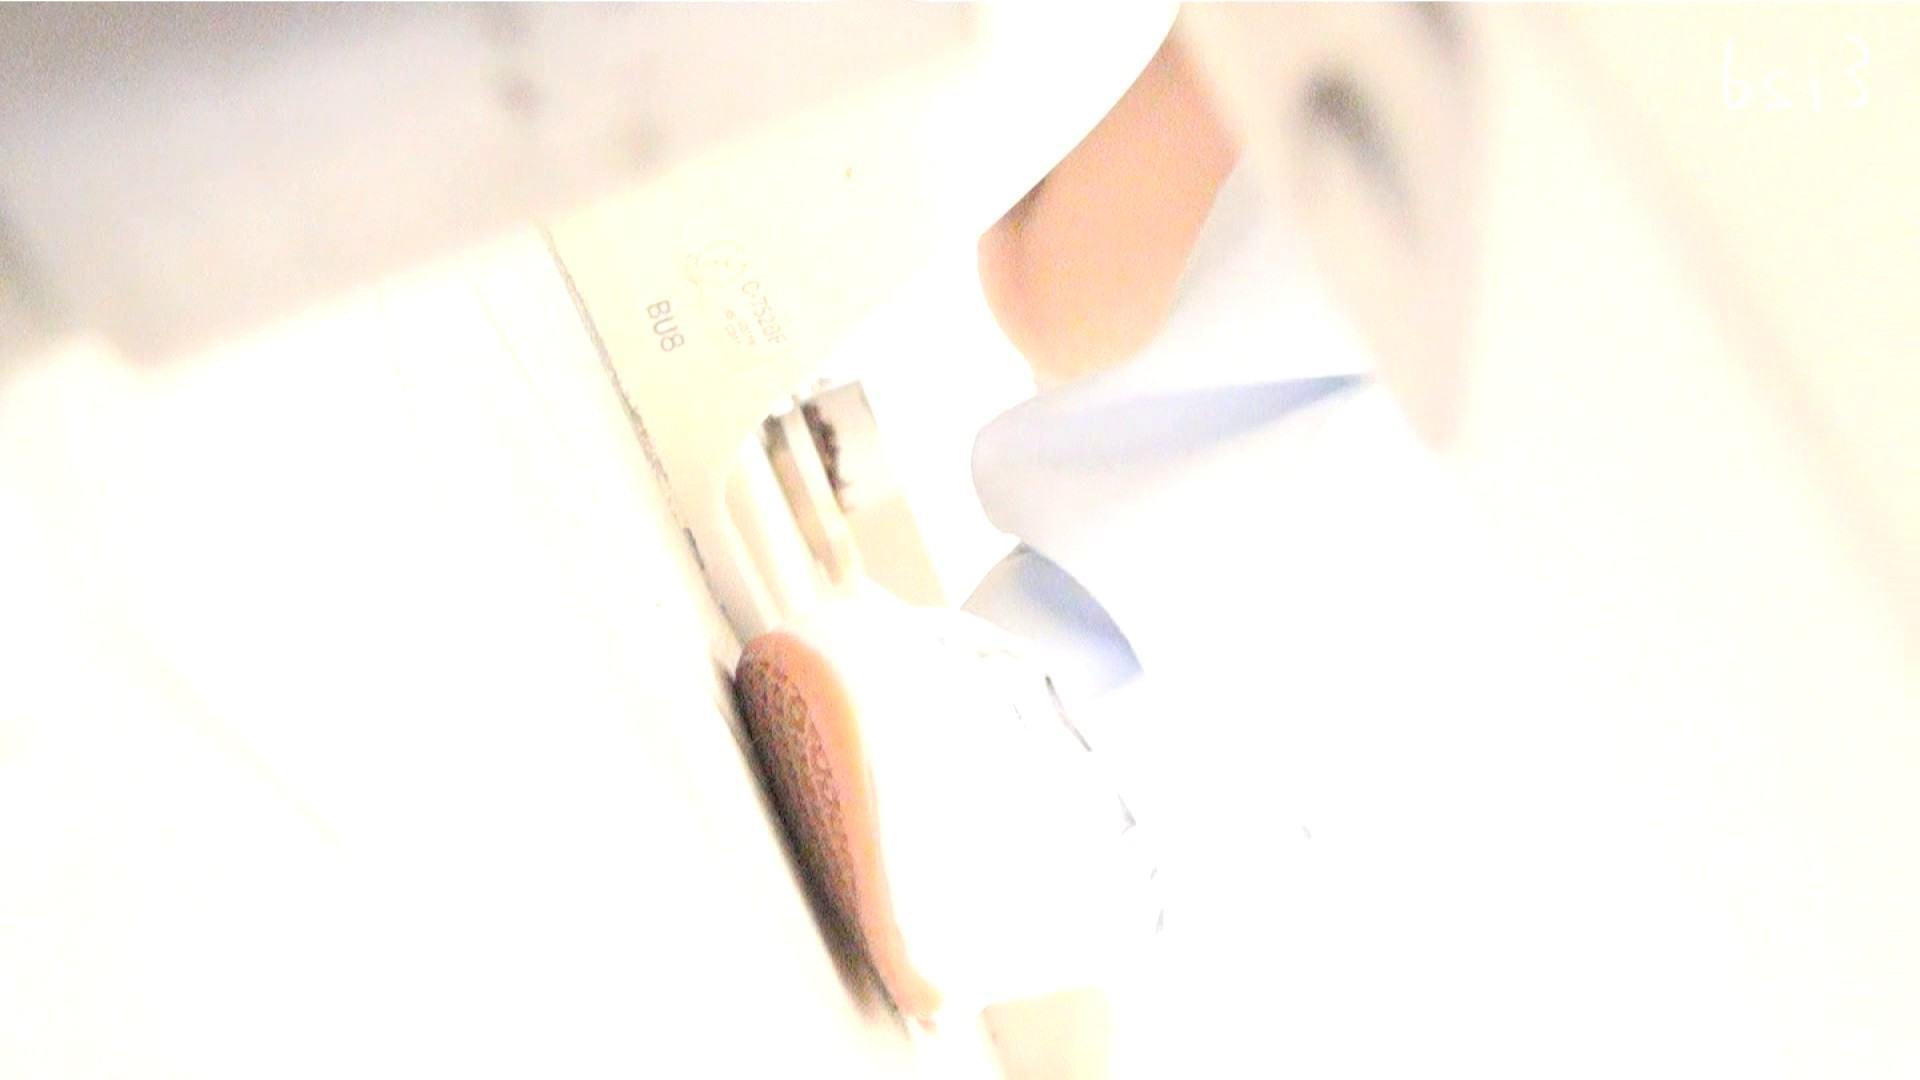 至高下半身盗撮-PREMIUM-【院内病棟編 】 vol.03 洗面所 AV無料動画キャプチャ 98連発 23